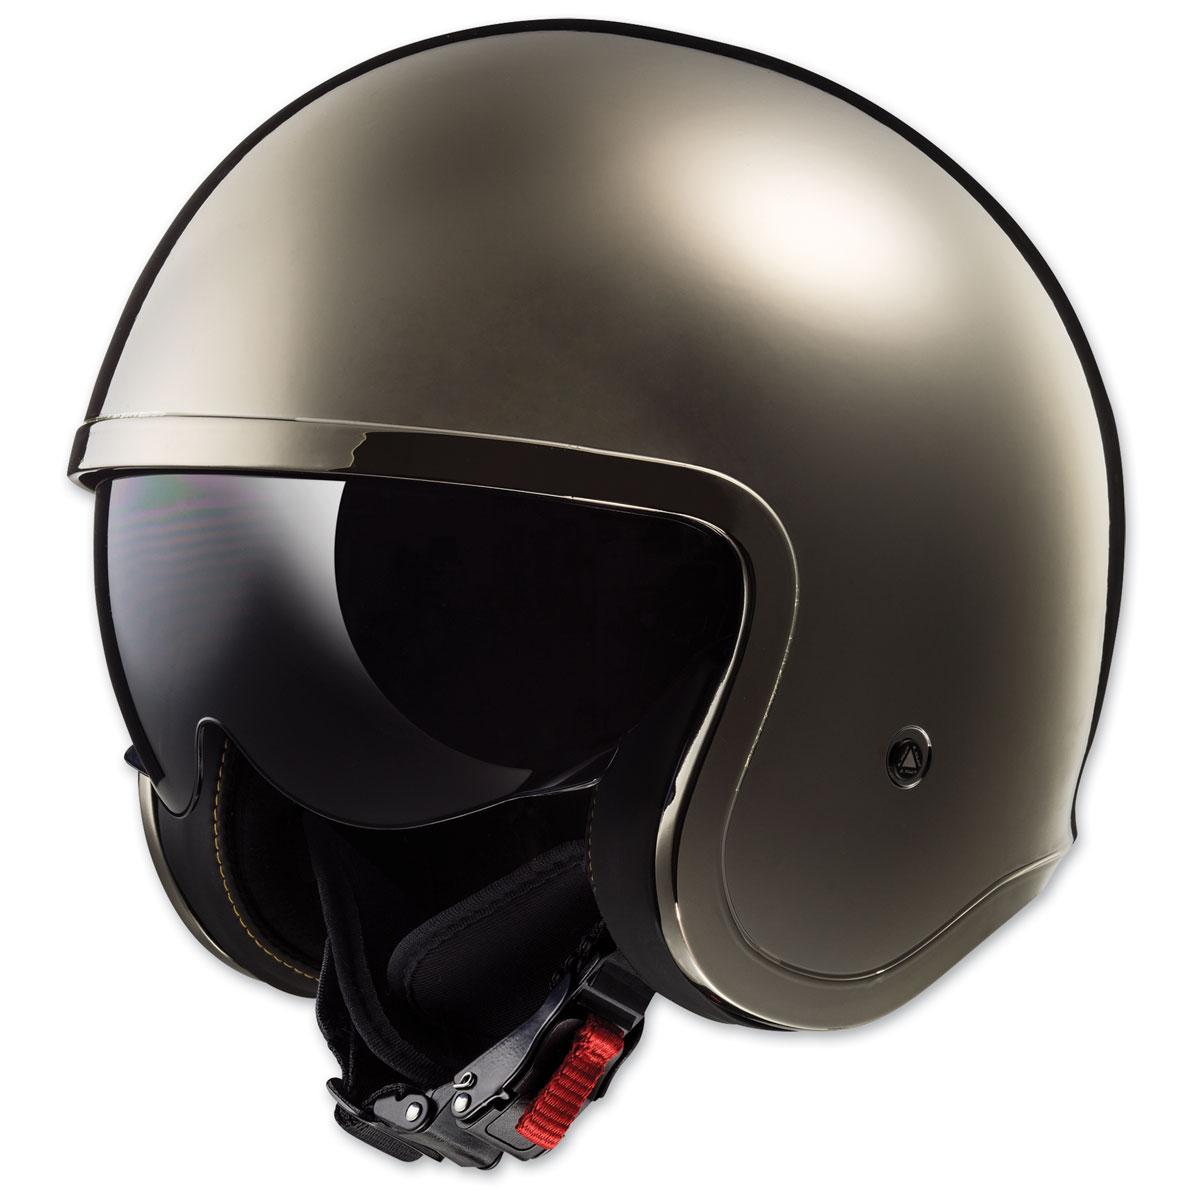 LS2 Spitfire Black Chrome Open Face Helmet